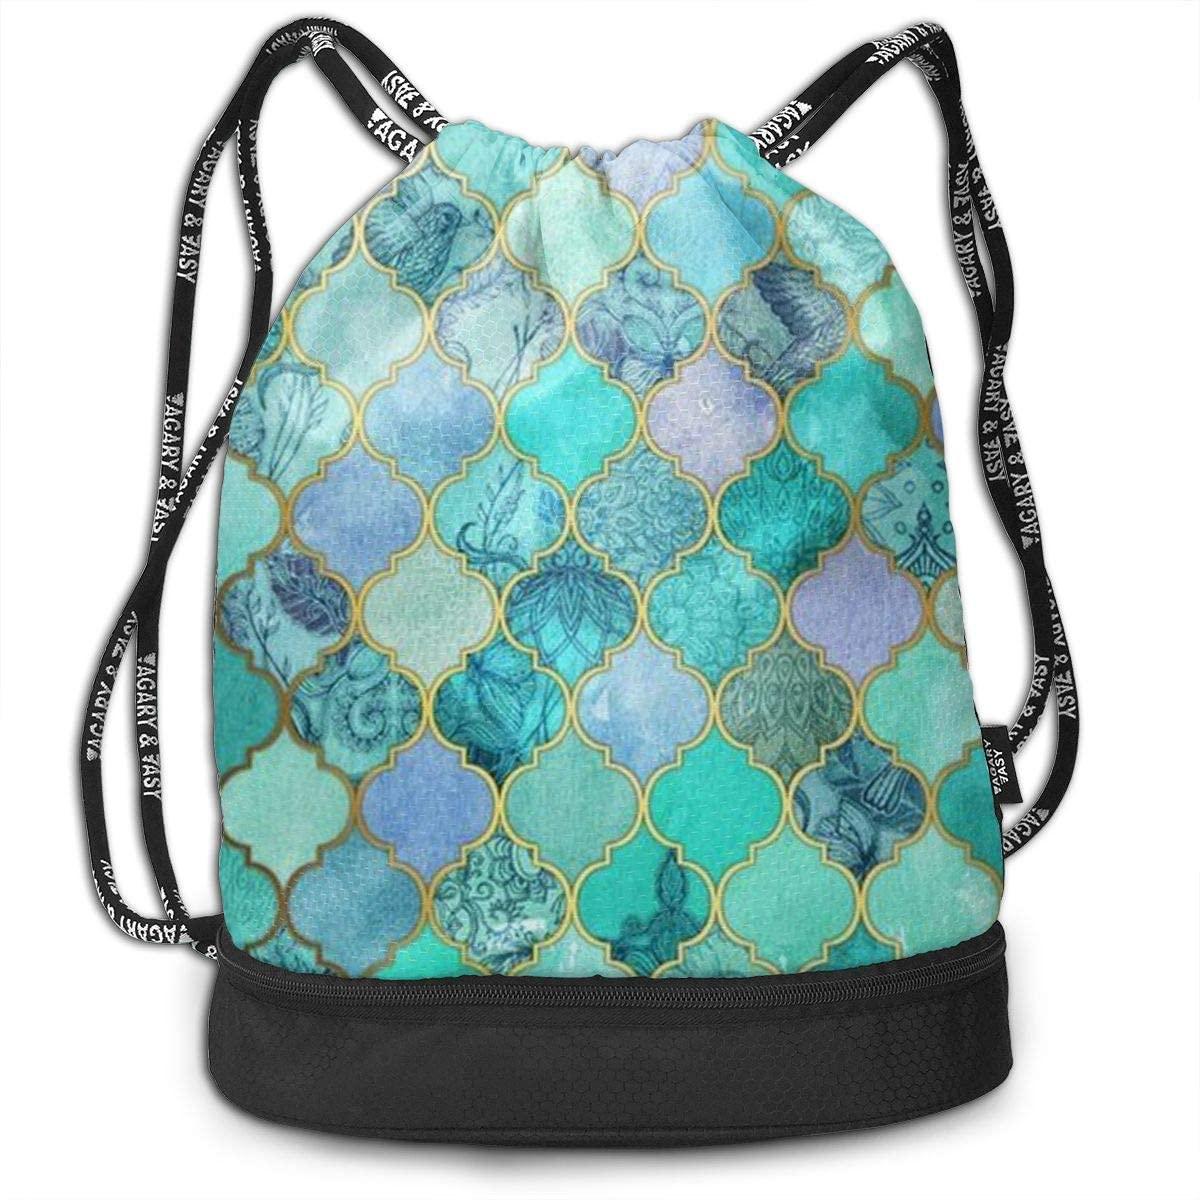 NiYoung Women & Men Drawstring Backpack Mermaid Fish Scales Mint Green Sports Gym Travel Bundle Backpack Bag